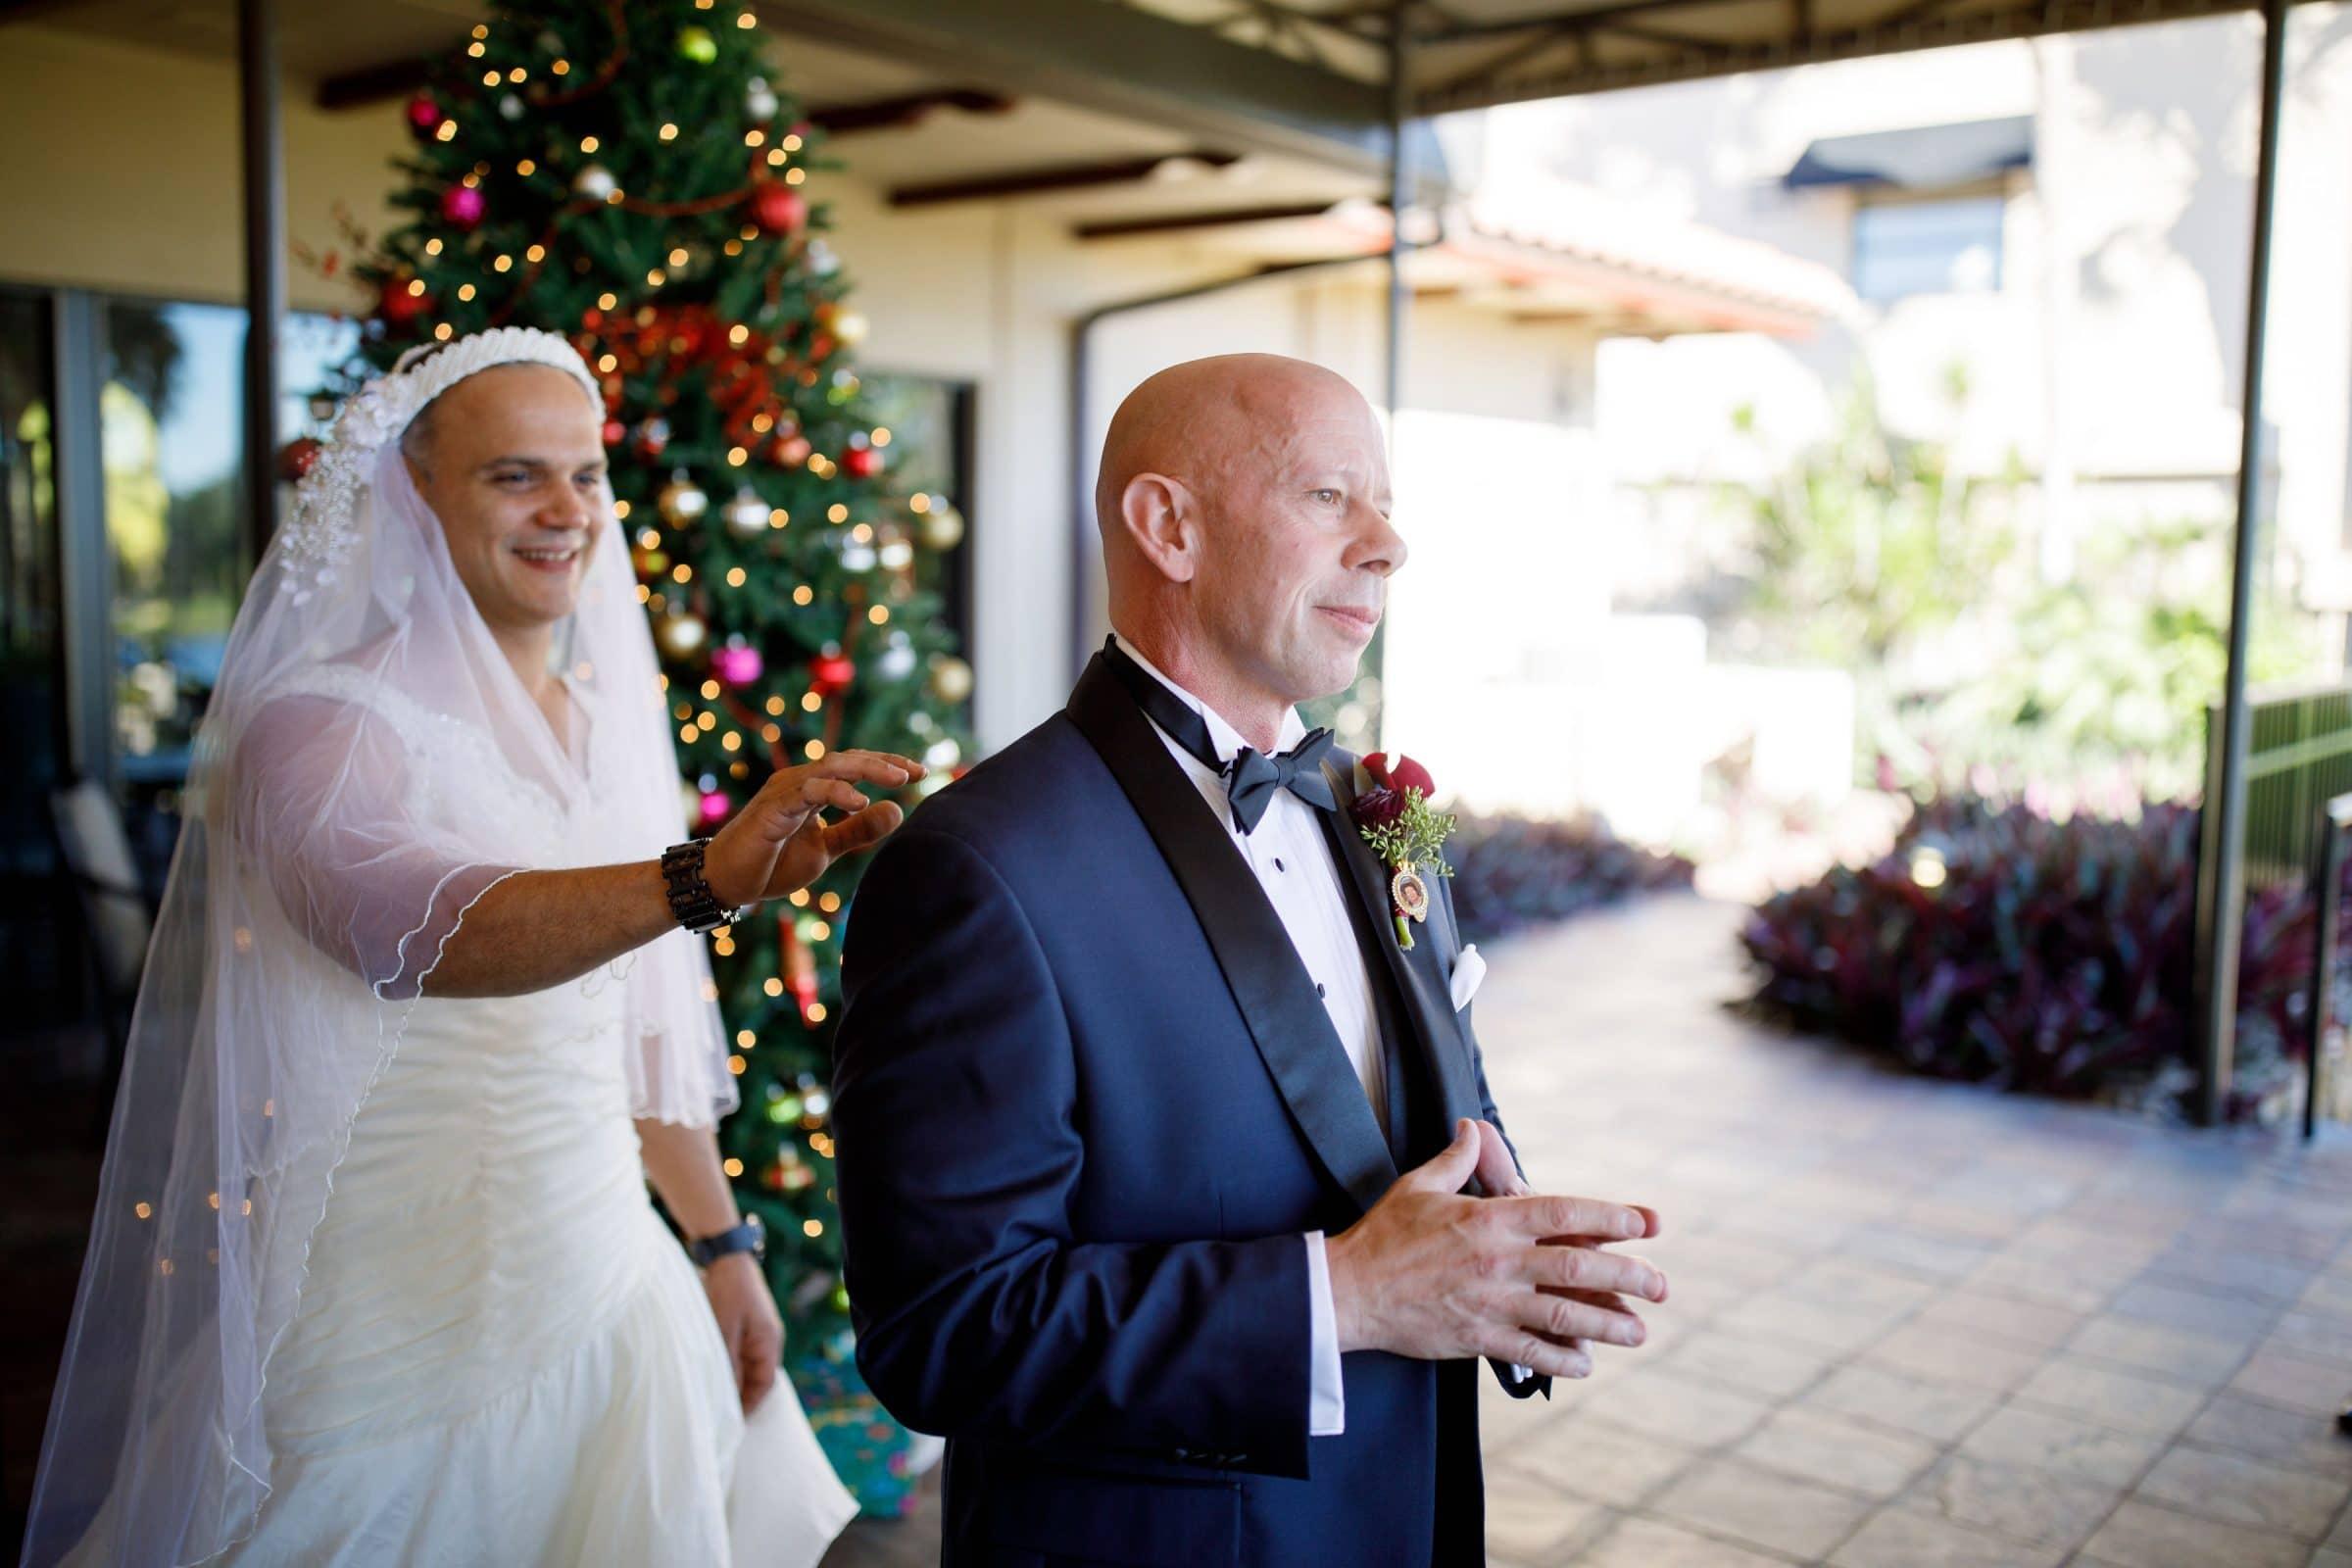 Man in wedding dress touching groom's shoulder